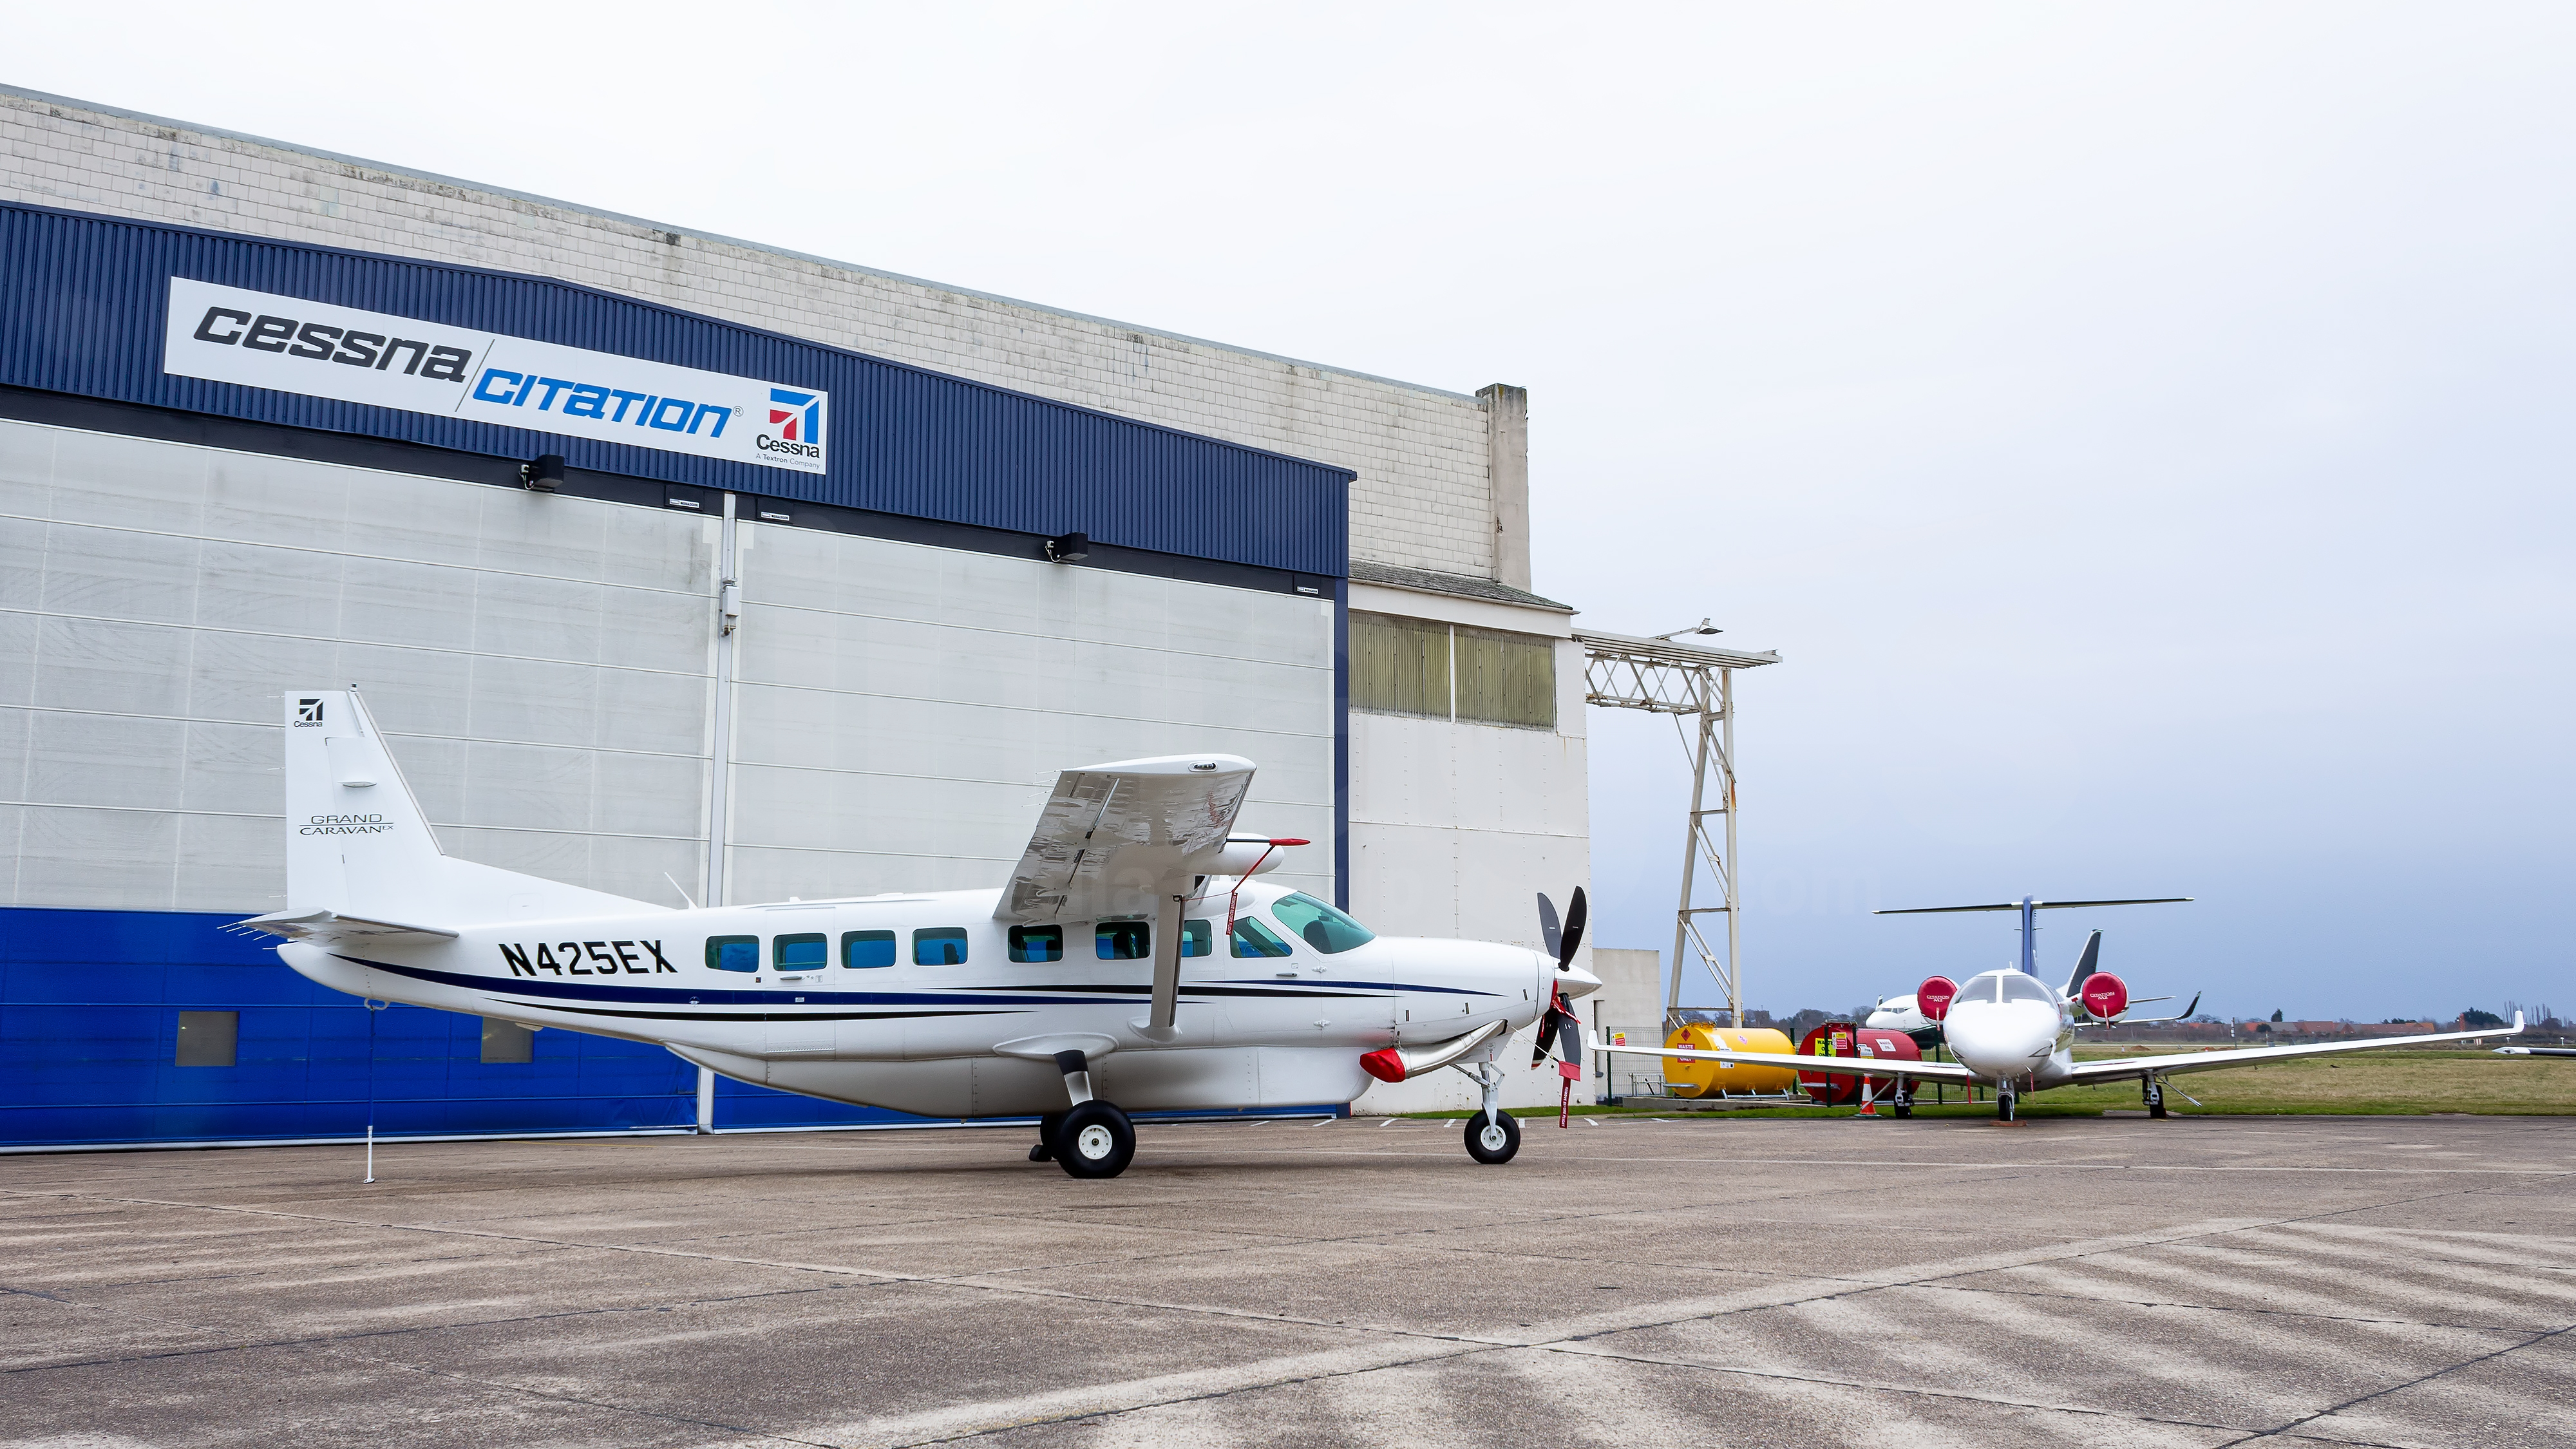 Textron Aviation Cessna 208b Grand Caravan Ex N425ex V1images Aviation Media